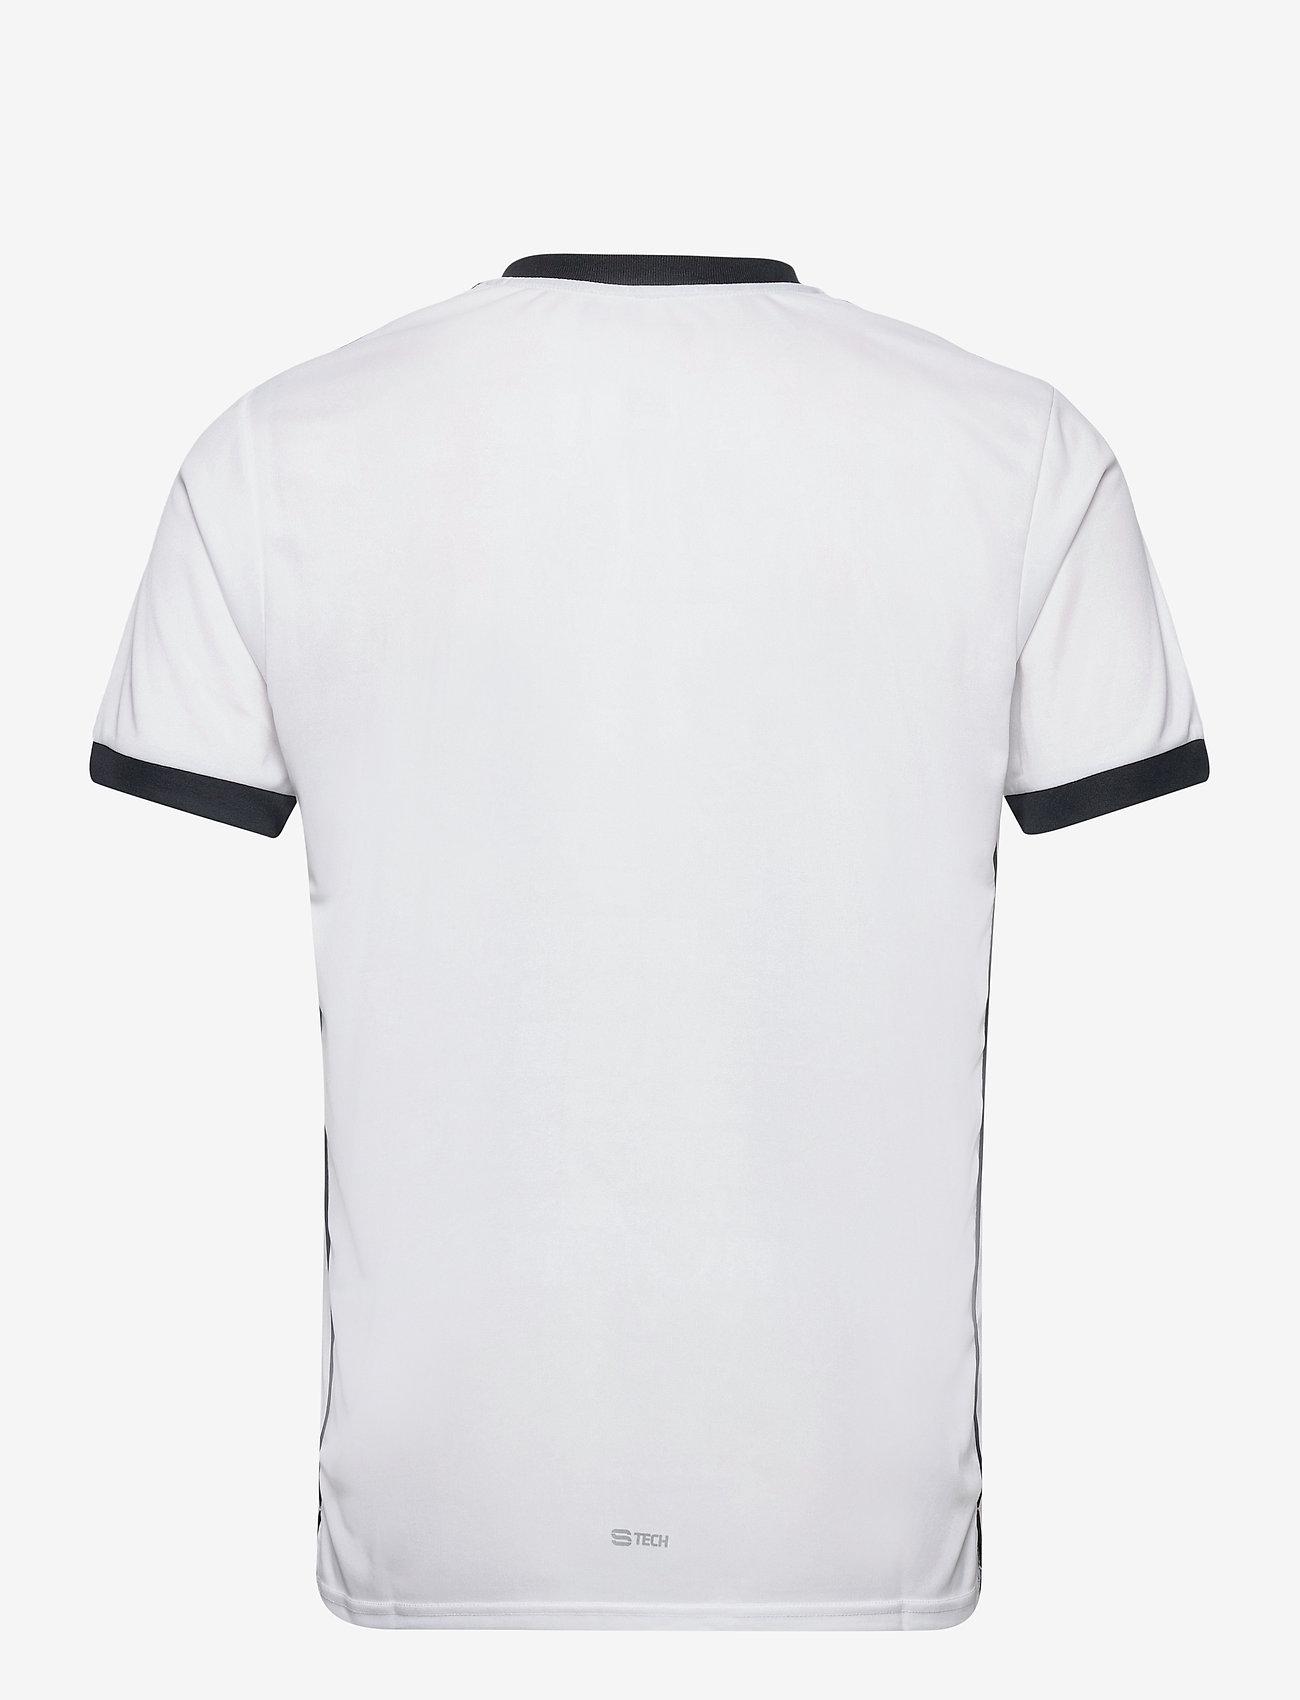 Sergio Tacchini - CLUB TECH T-SHIRT - t-shirts - white/navy - 1